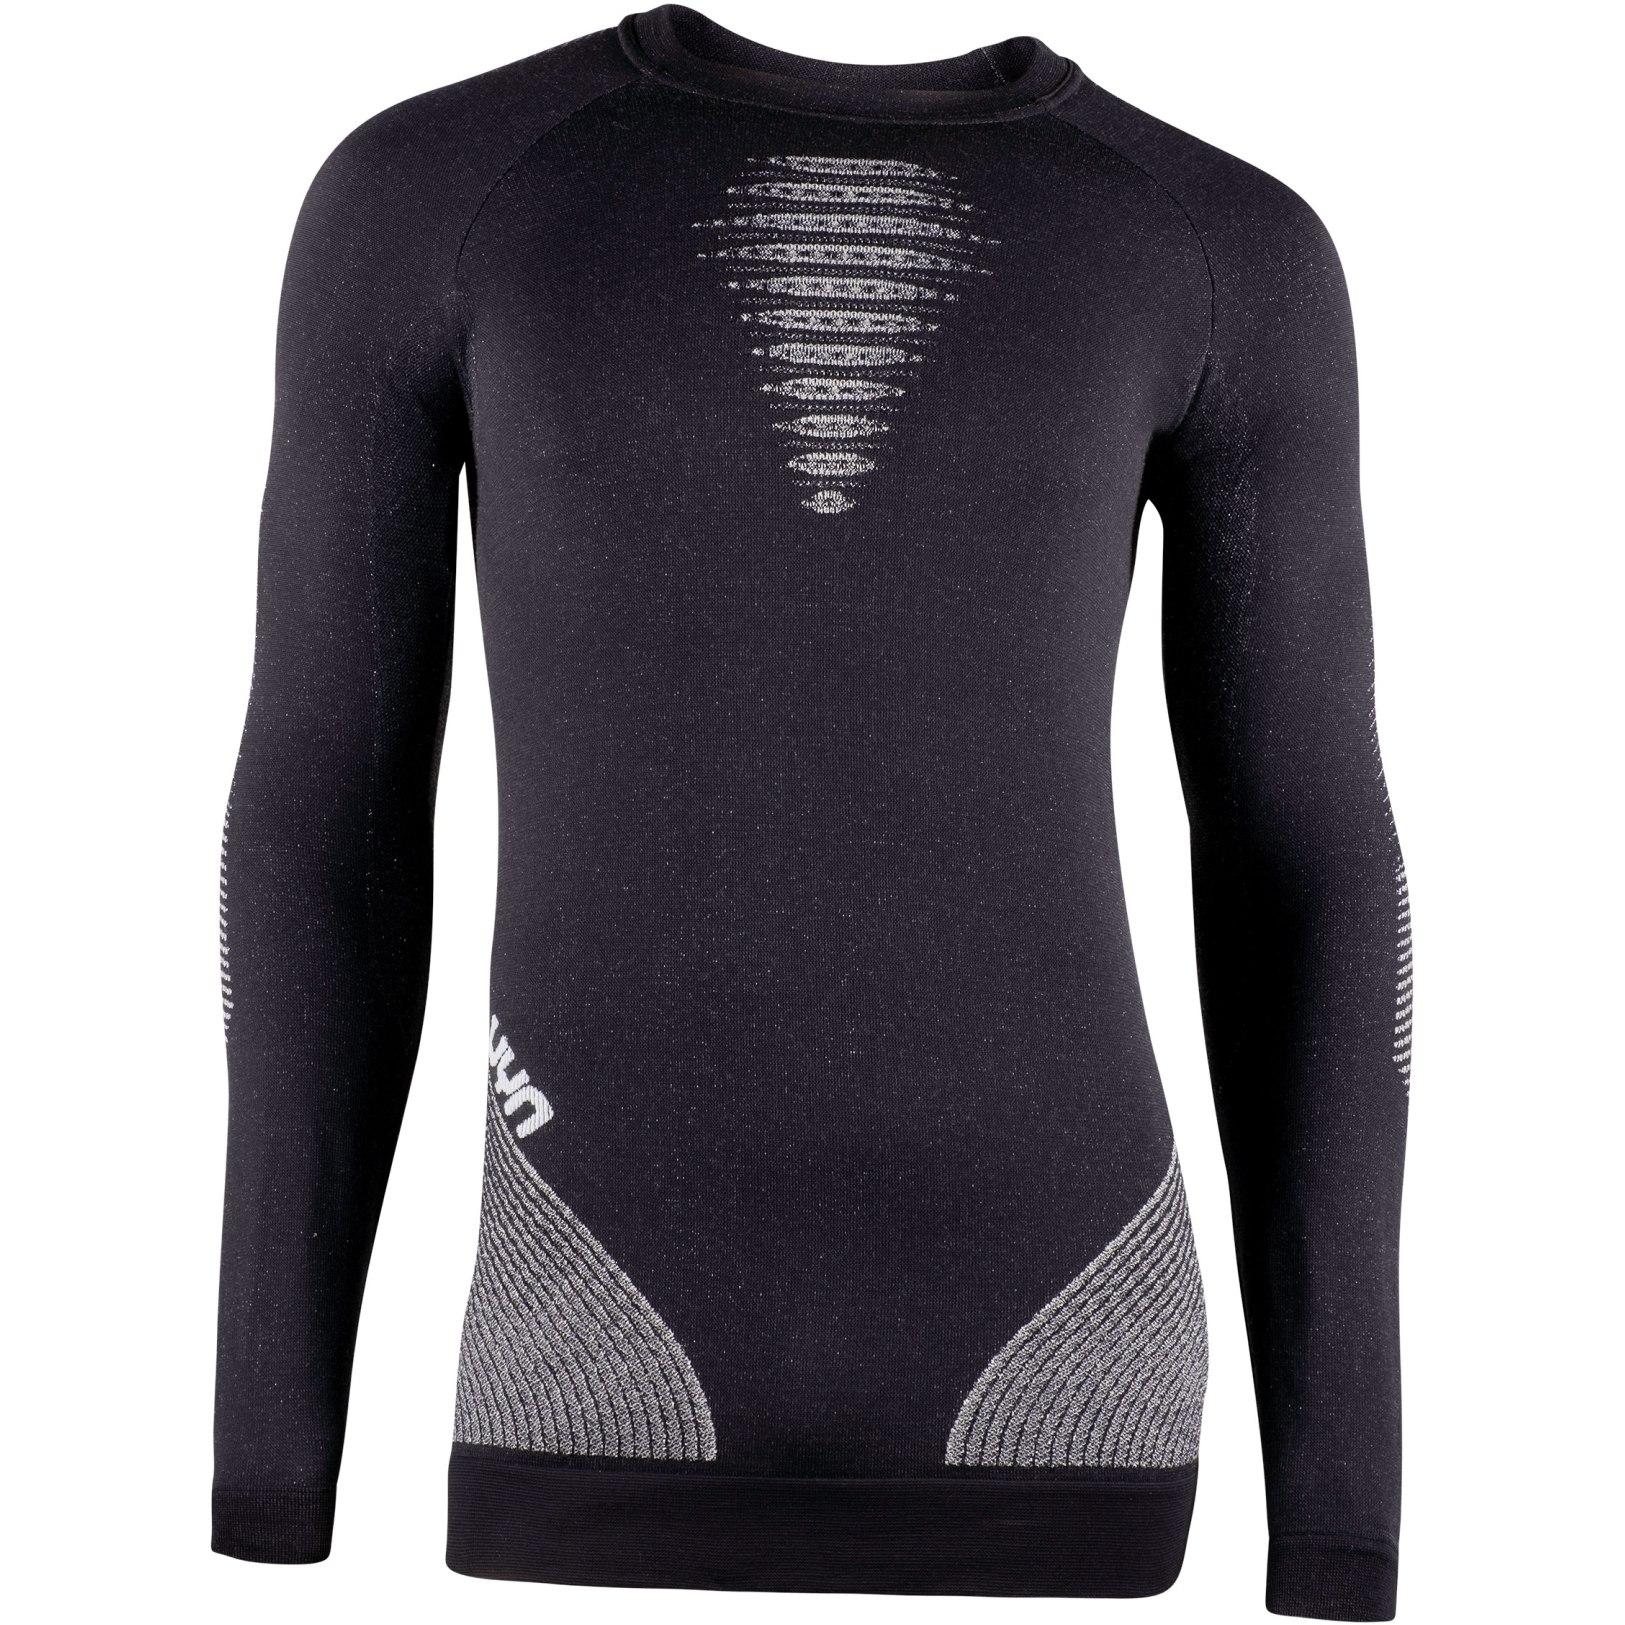 UYN Cashmere Shiny 2.0 Man Underwear Shirt Long Sleeves Round Neck - Celebrity Silver